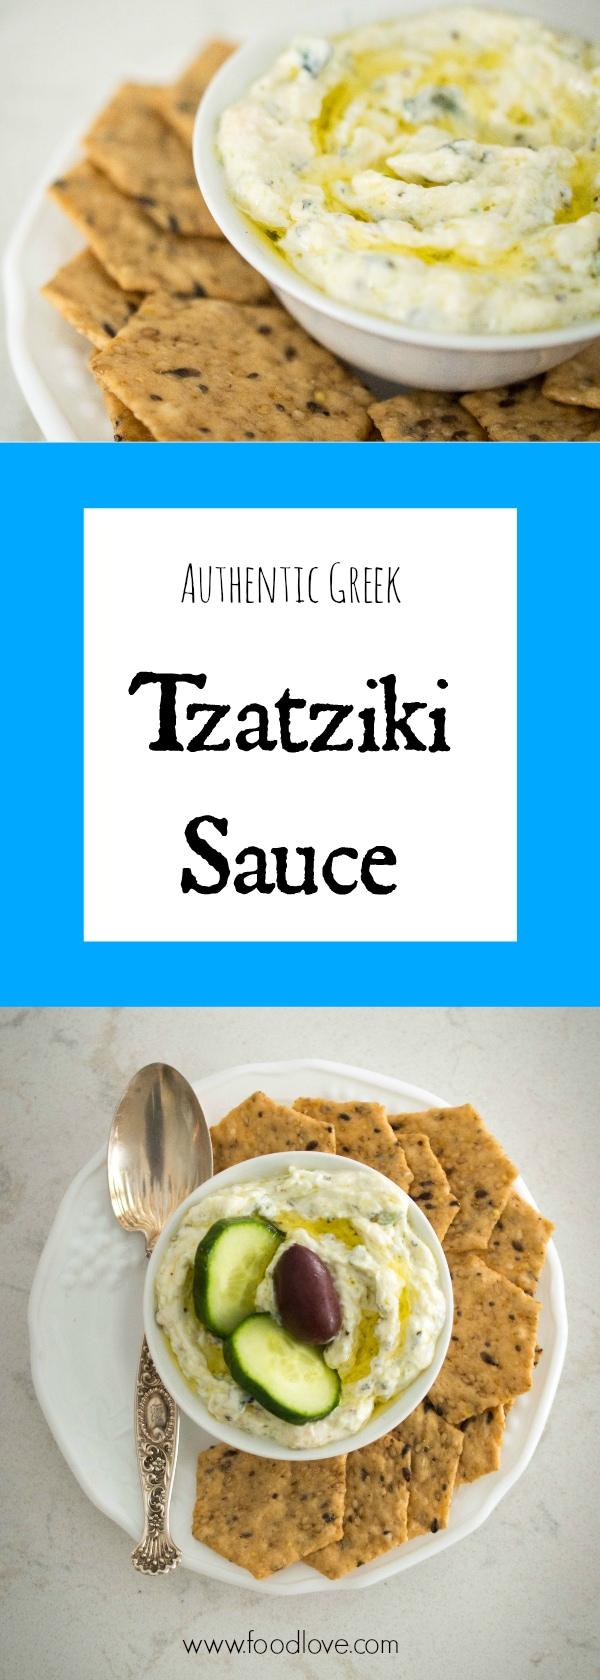 Authentic Greek Tzatziki Sauce